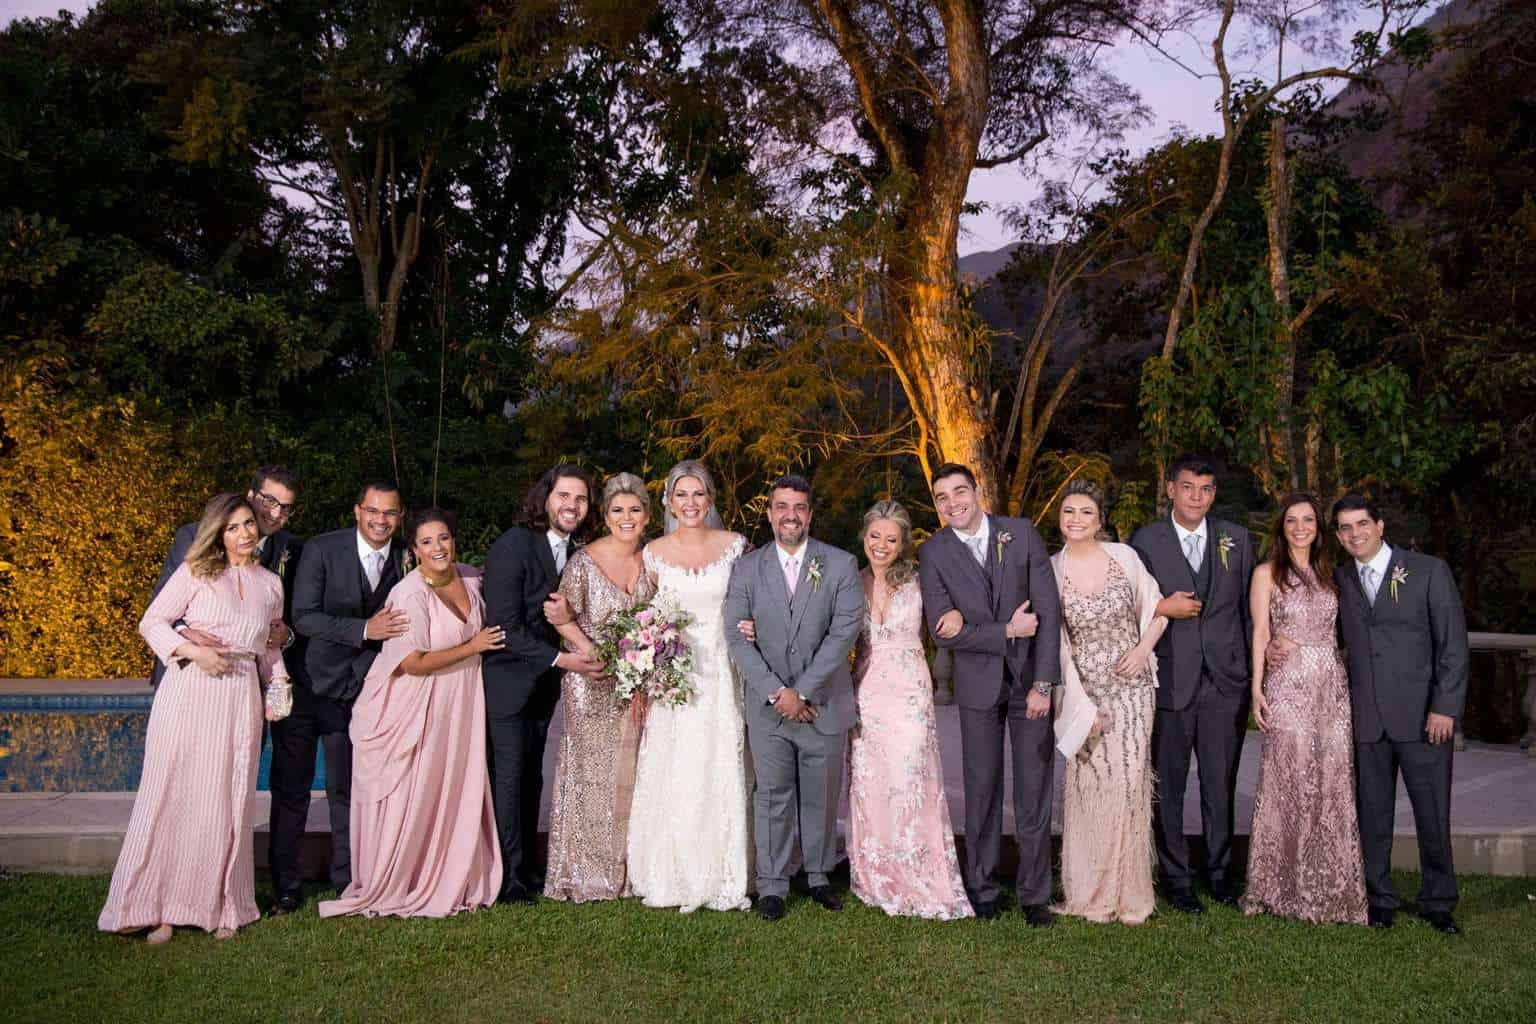 Andrea-Kapps-casamento-de-dia-casamento-na-serra-casamento-romântico-casamento-tradicional-Locanda-de-La-Mimosa-padrinhos-rosa-e-lilás-casamento-35-1